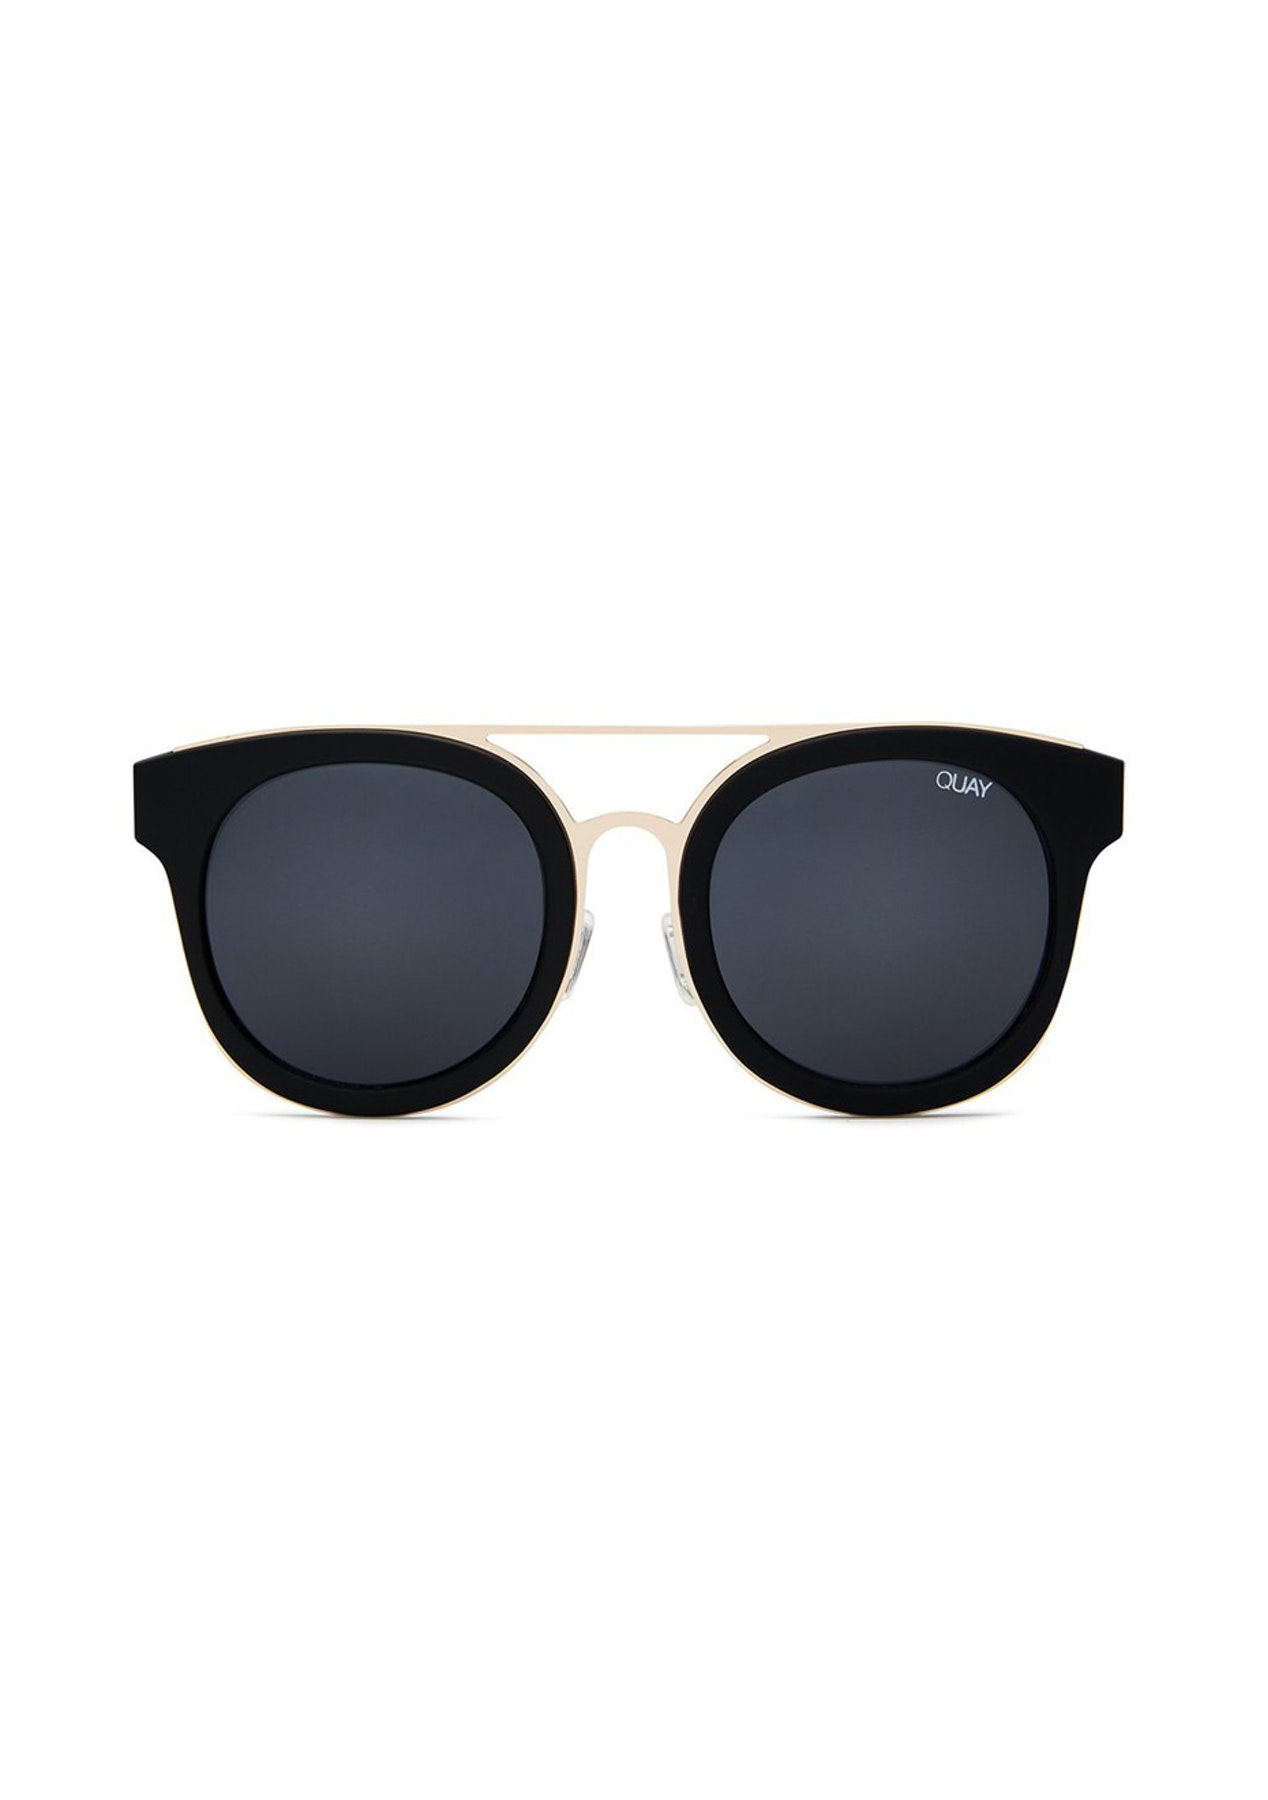 a3bead3117fc0 Quay - Brooklyn - Black   Smoke - Eyewear Favourites - Onceit